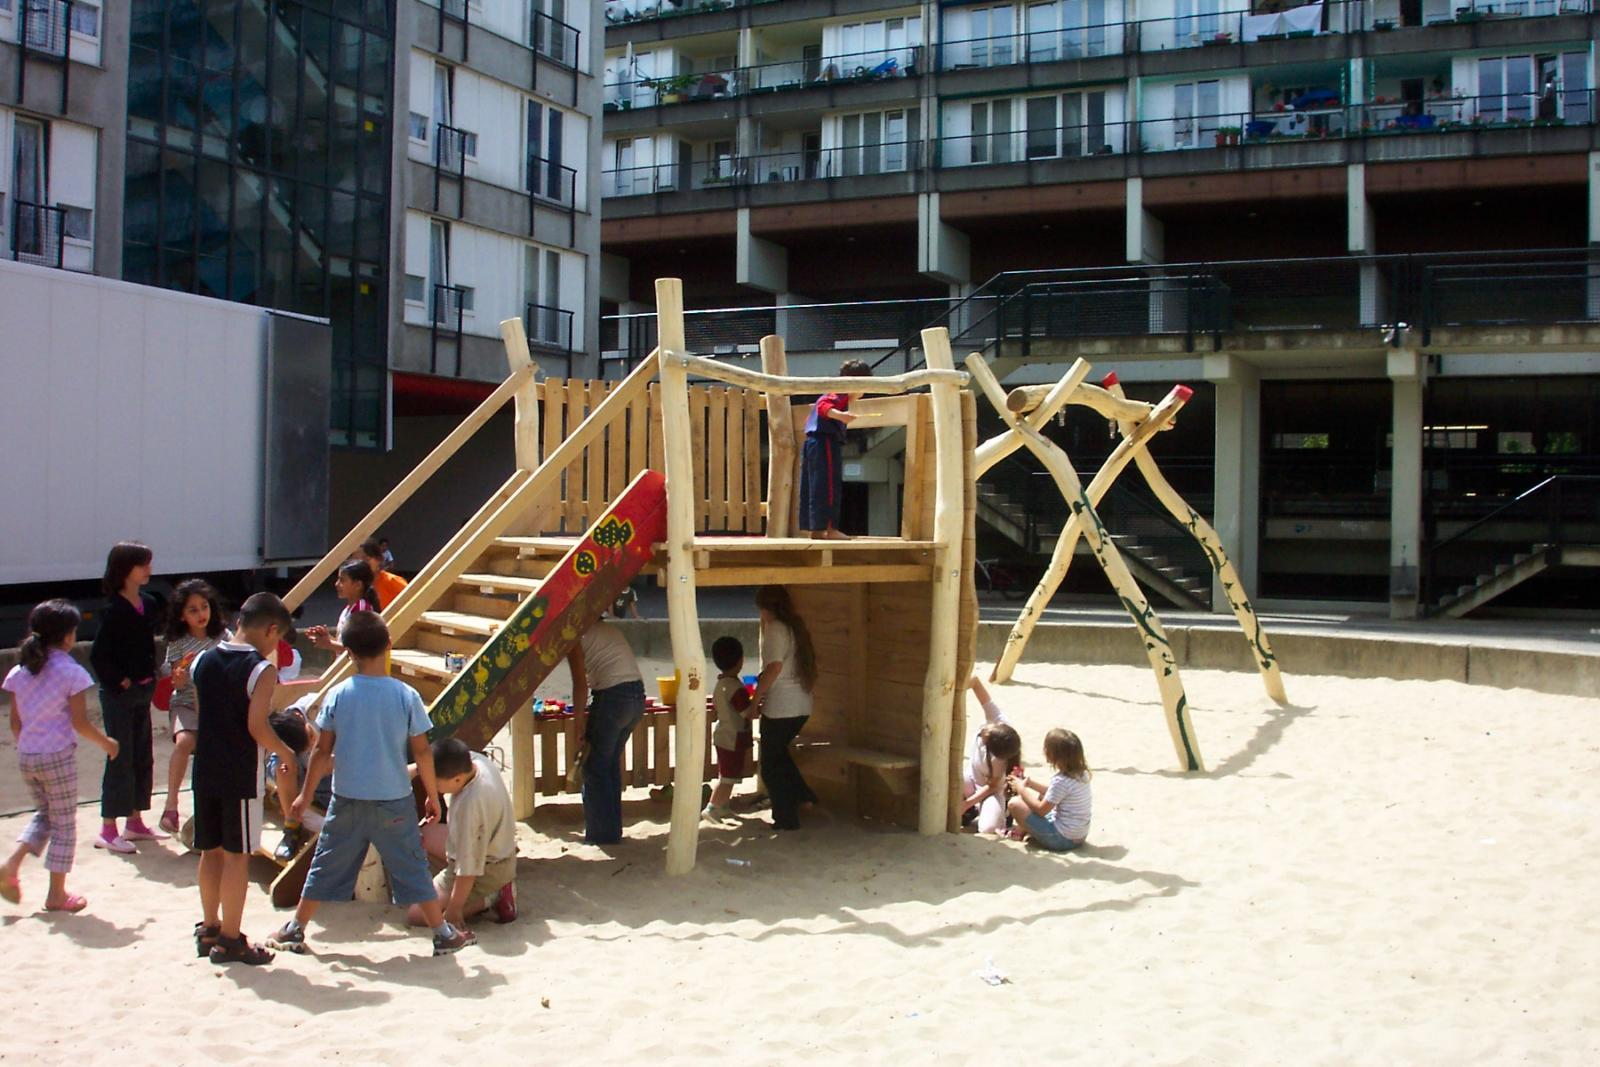 kinderspielplatz bau kinderspielpl tze mit spielplatzger ten spielger te reba immobilien ag. Black Bedroom Furniture Sets. Home Design Ideas